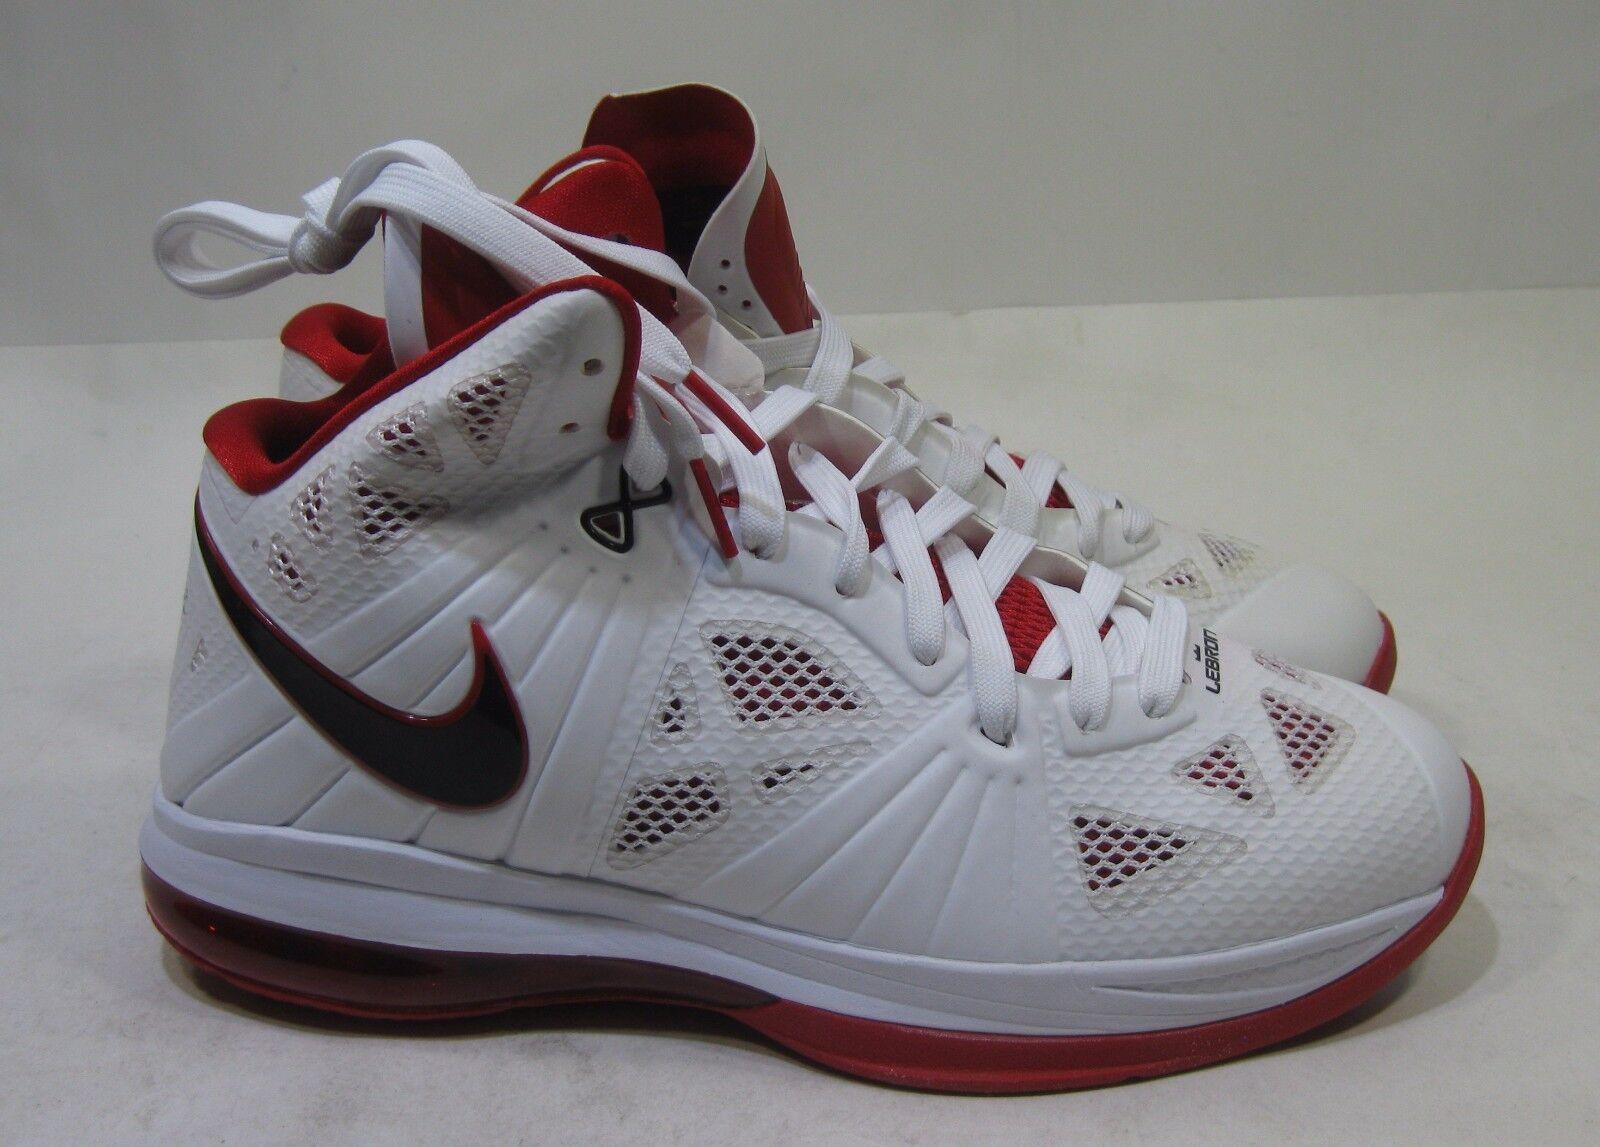 Nike Lebron Viii 8.S. White Black Sport Red 441946-100 Rare Size 9